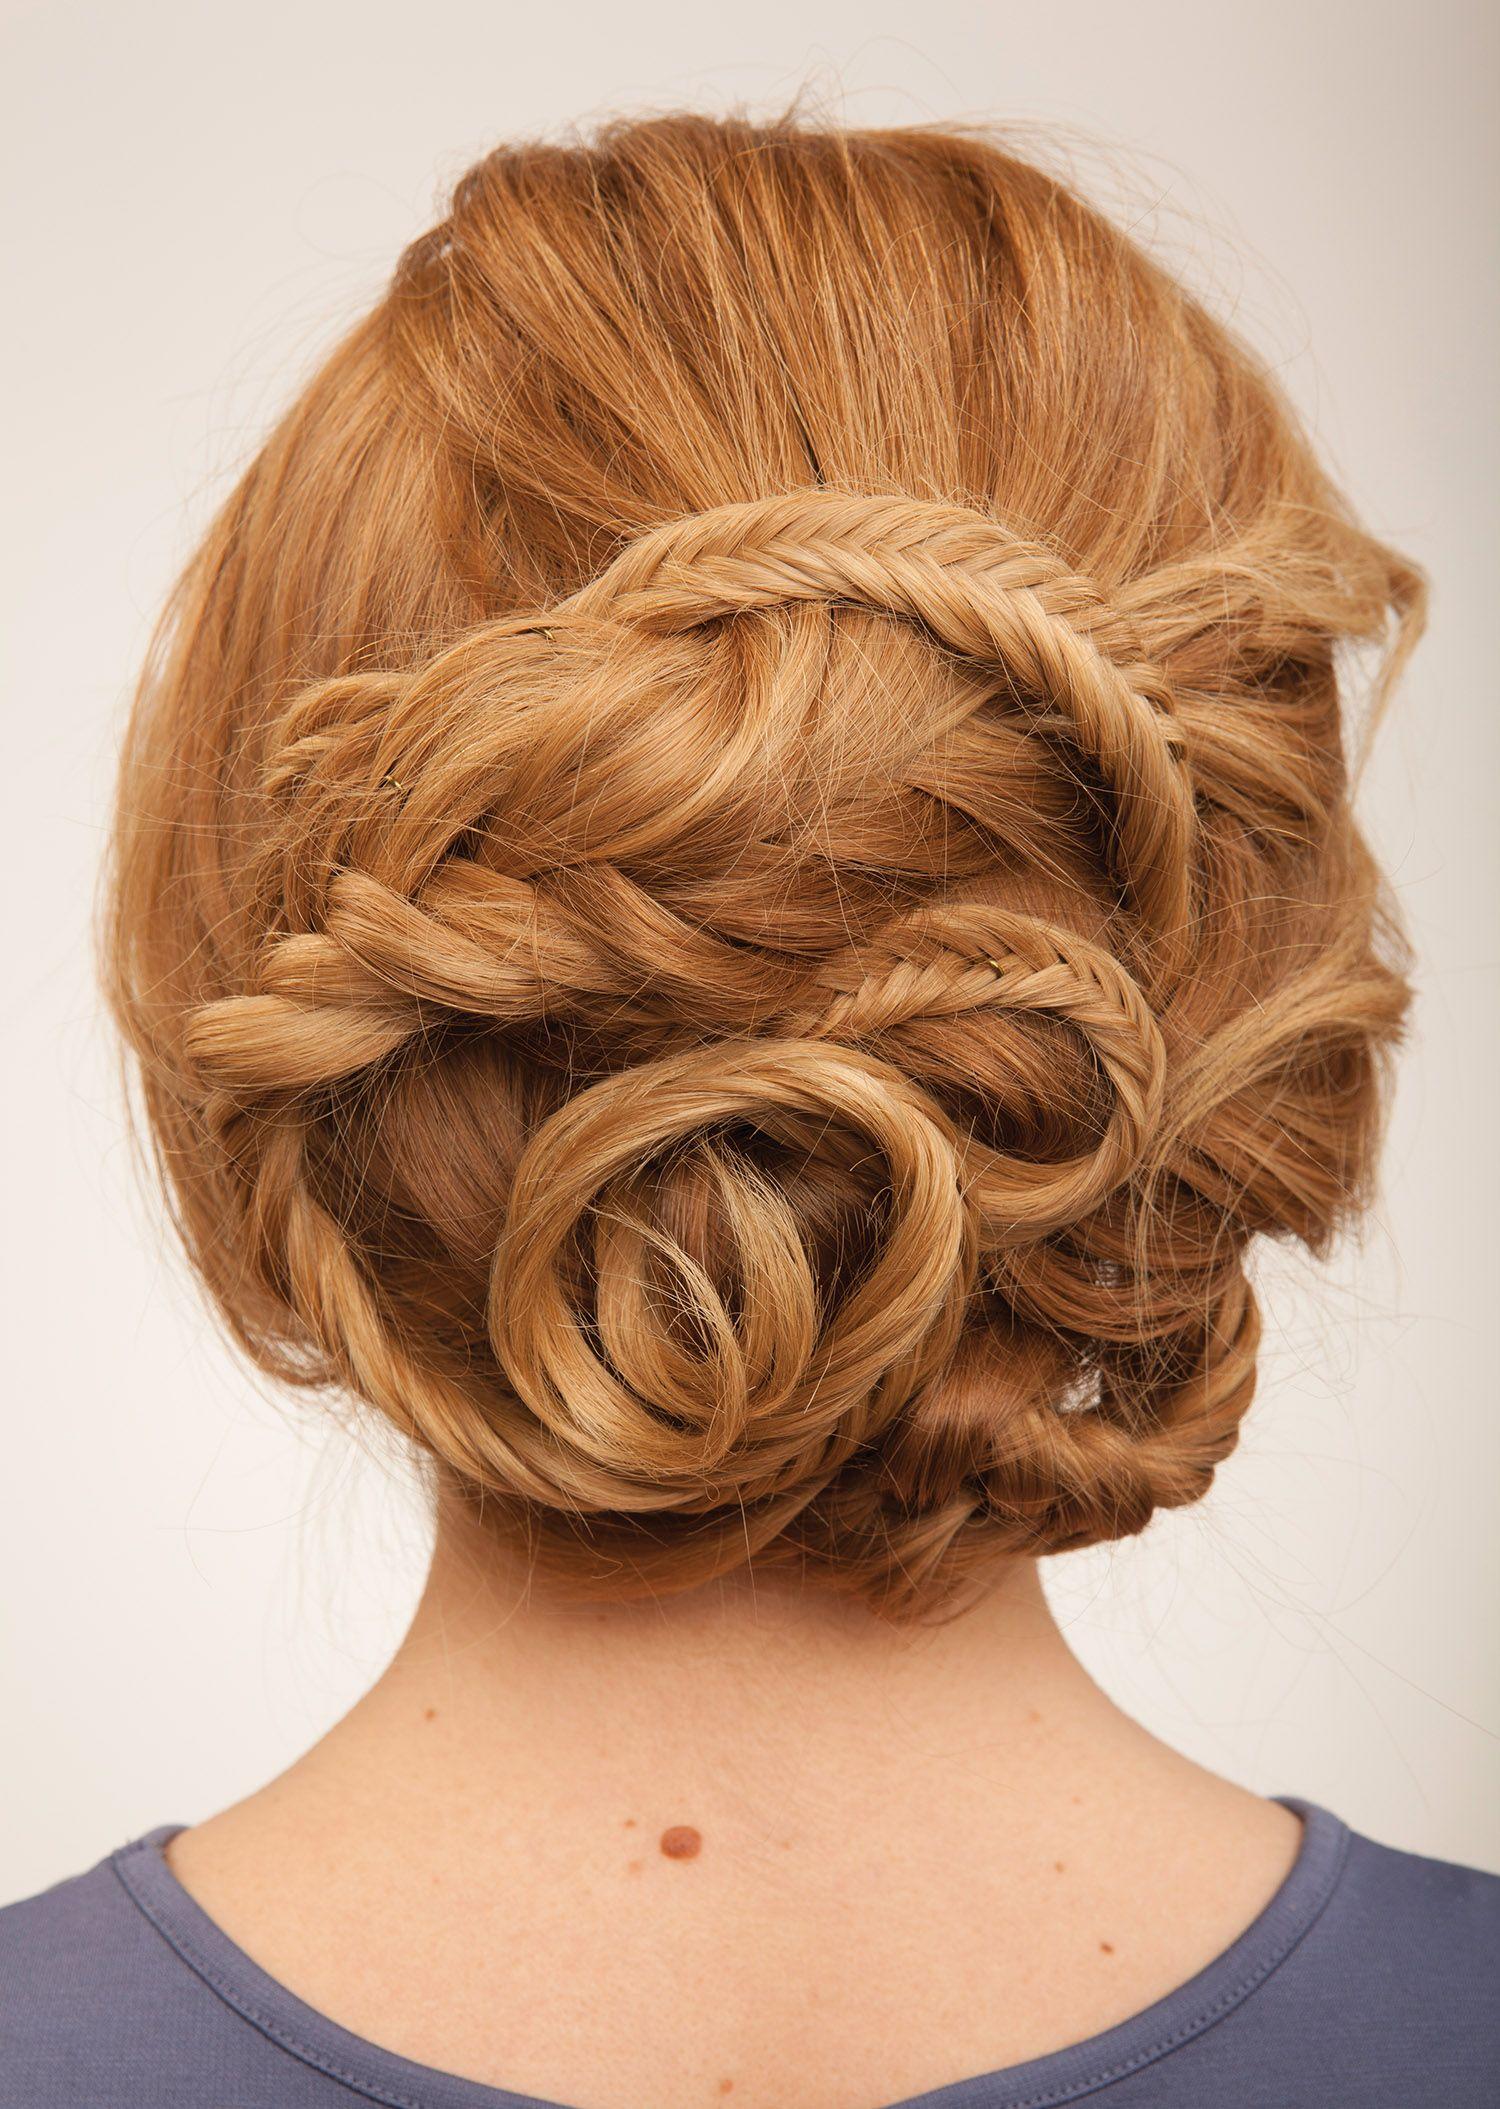 4 Pro Hair Tips That Make Braiding Easy Long Hair Styles Wedding Hairstyles For Long Hair Hair Styles